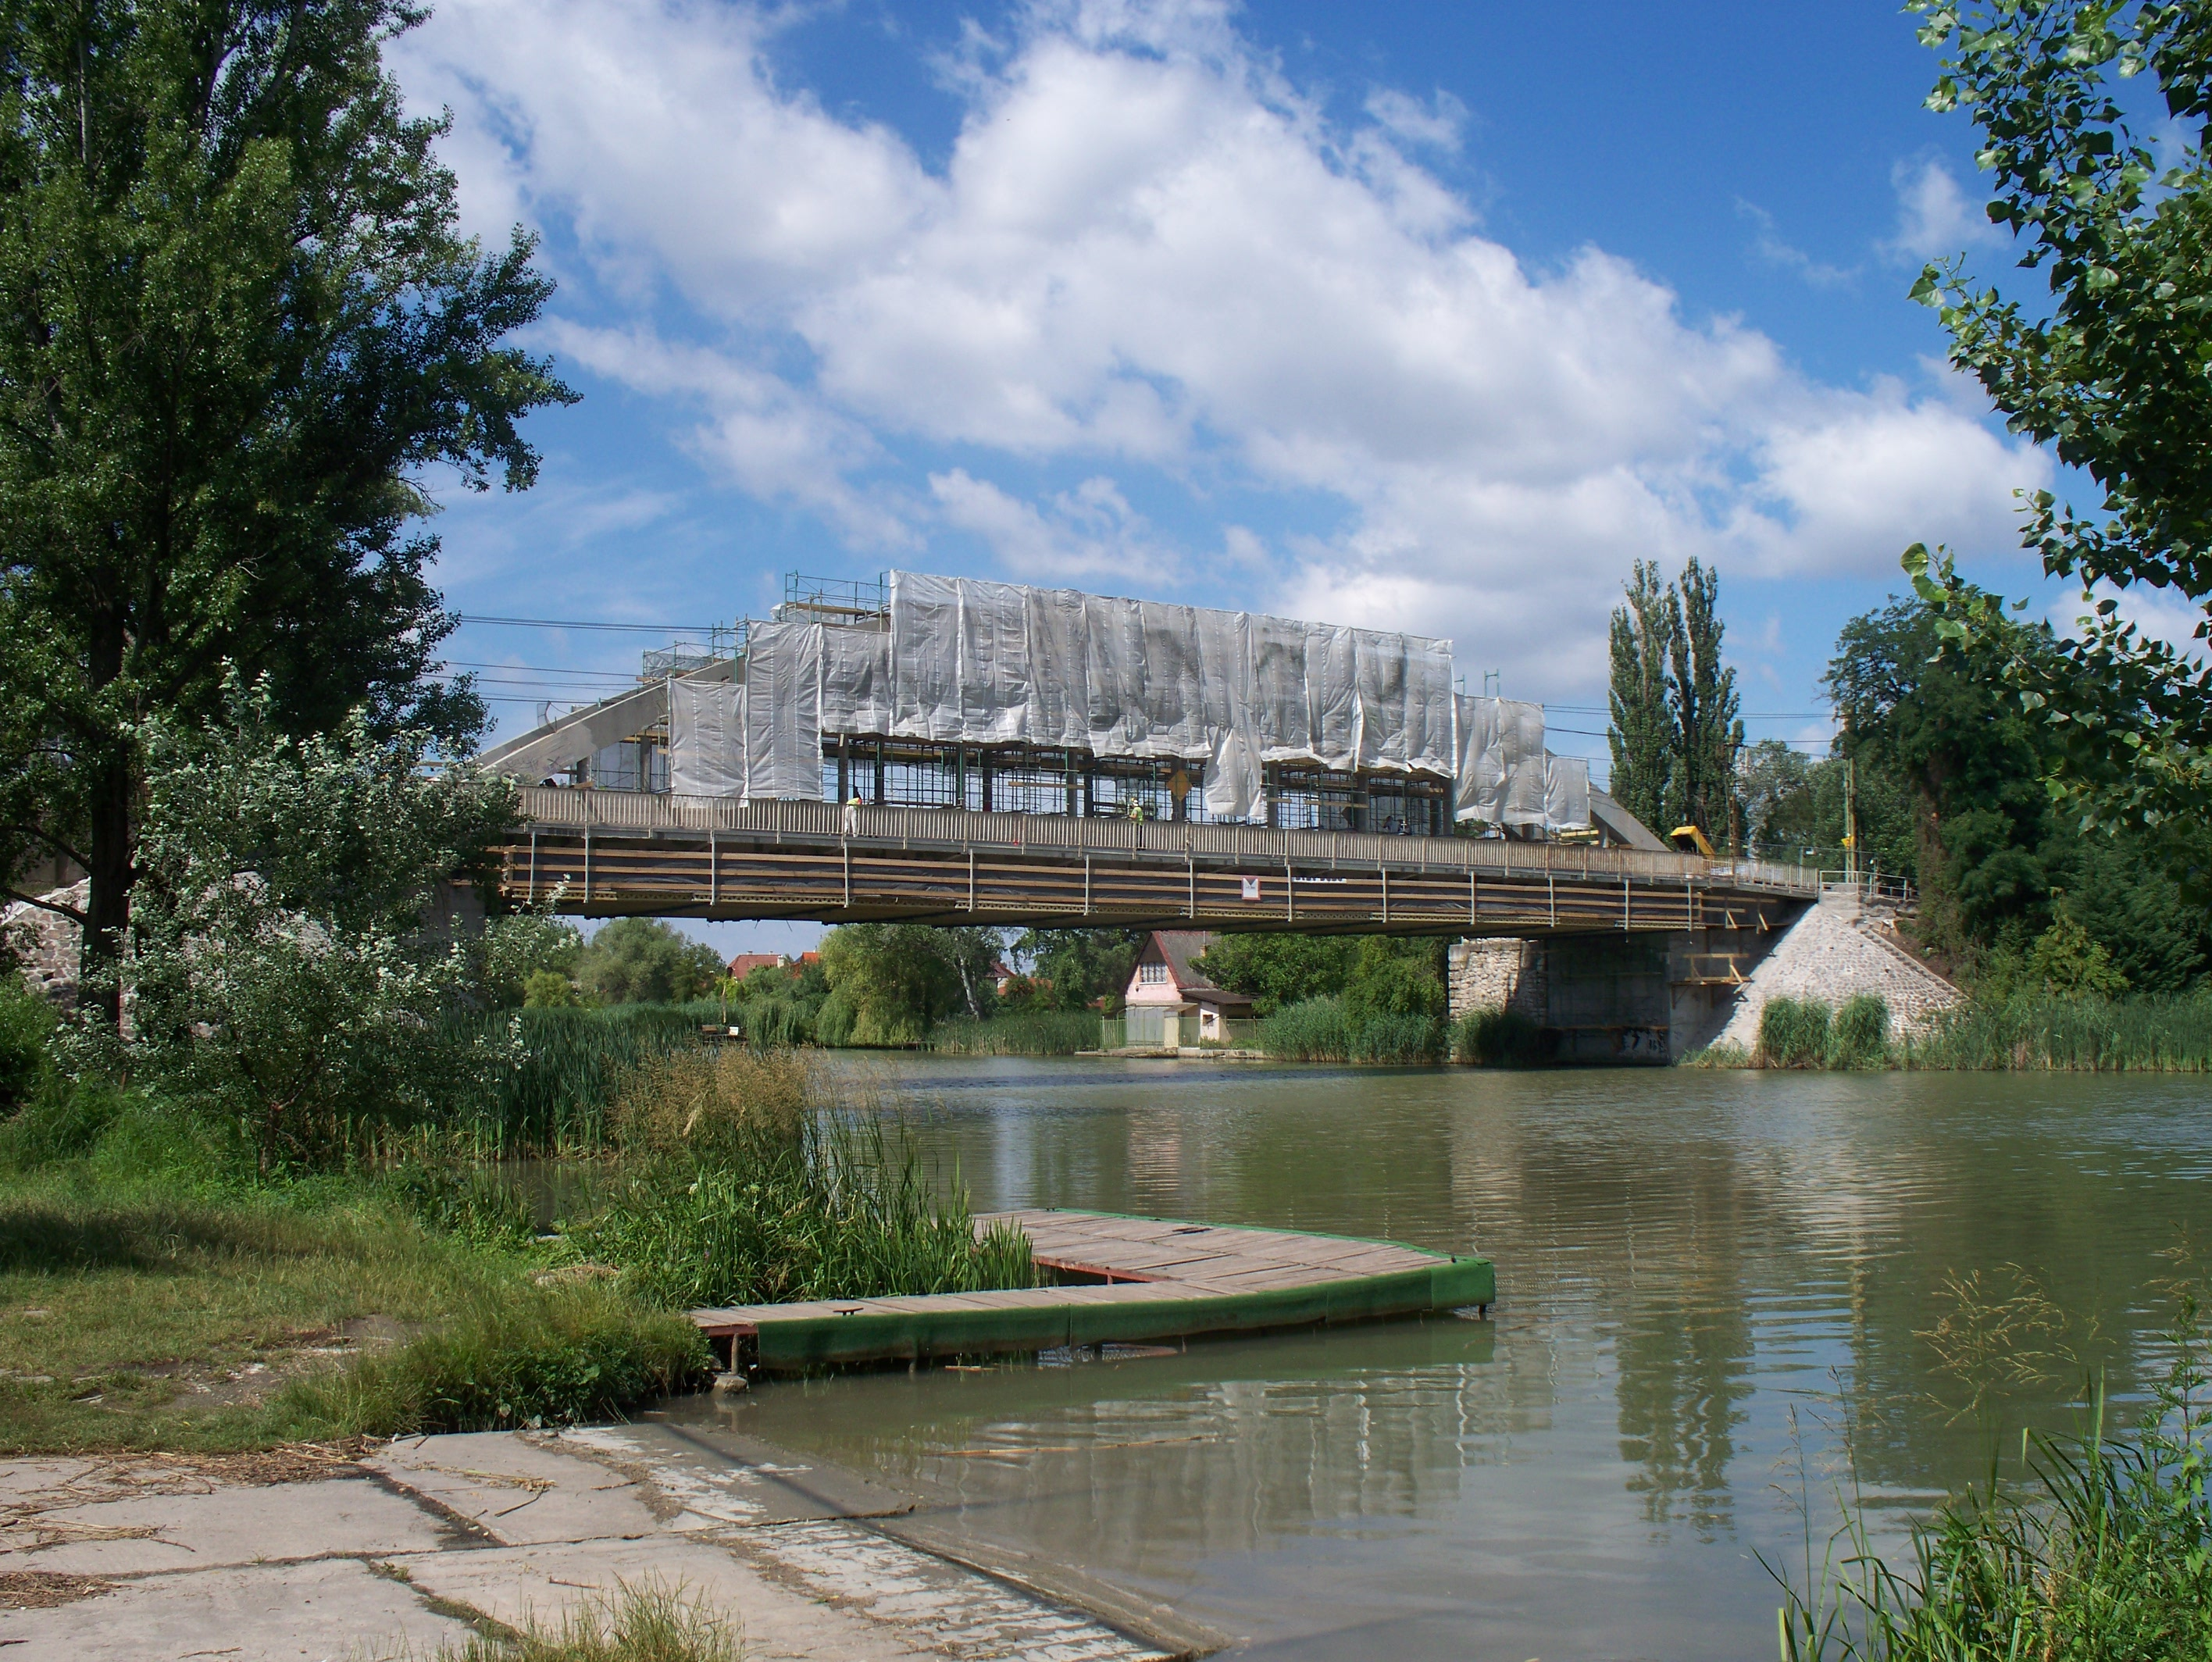 http://www.kisdunainagyhajok.hu/kis-dunai_hidak/dunaharaszti-vasuti-hid_felujitas2012/dunaharaszti-vasuti-hid_felujitas2012_056.jpg